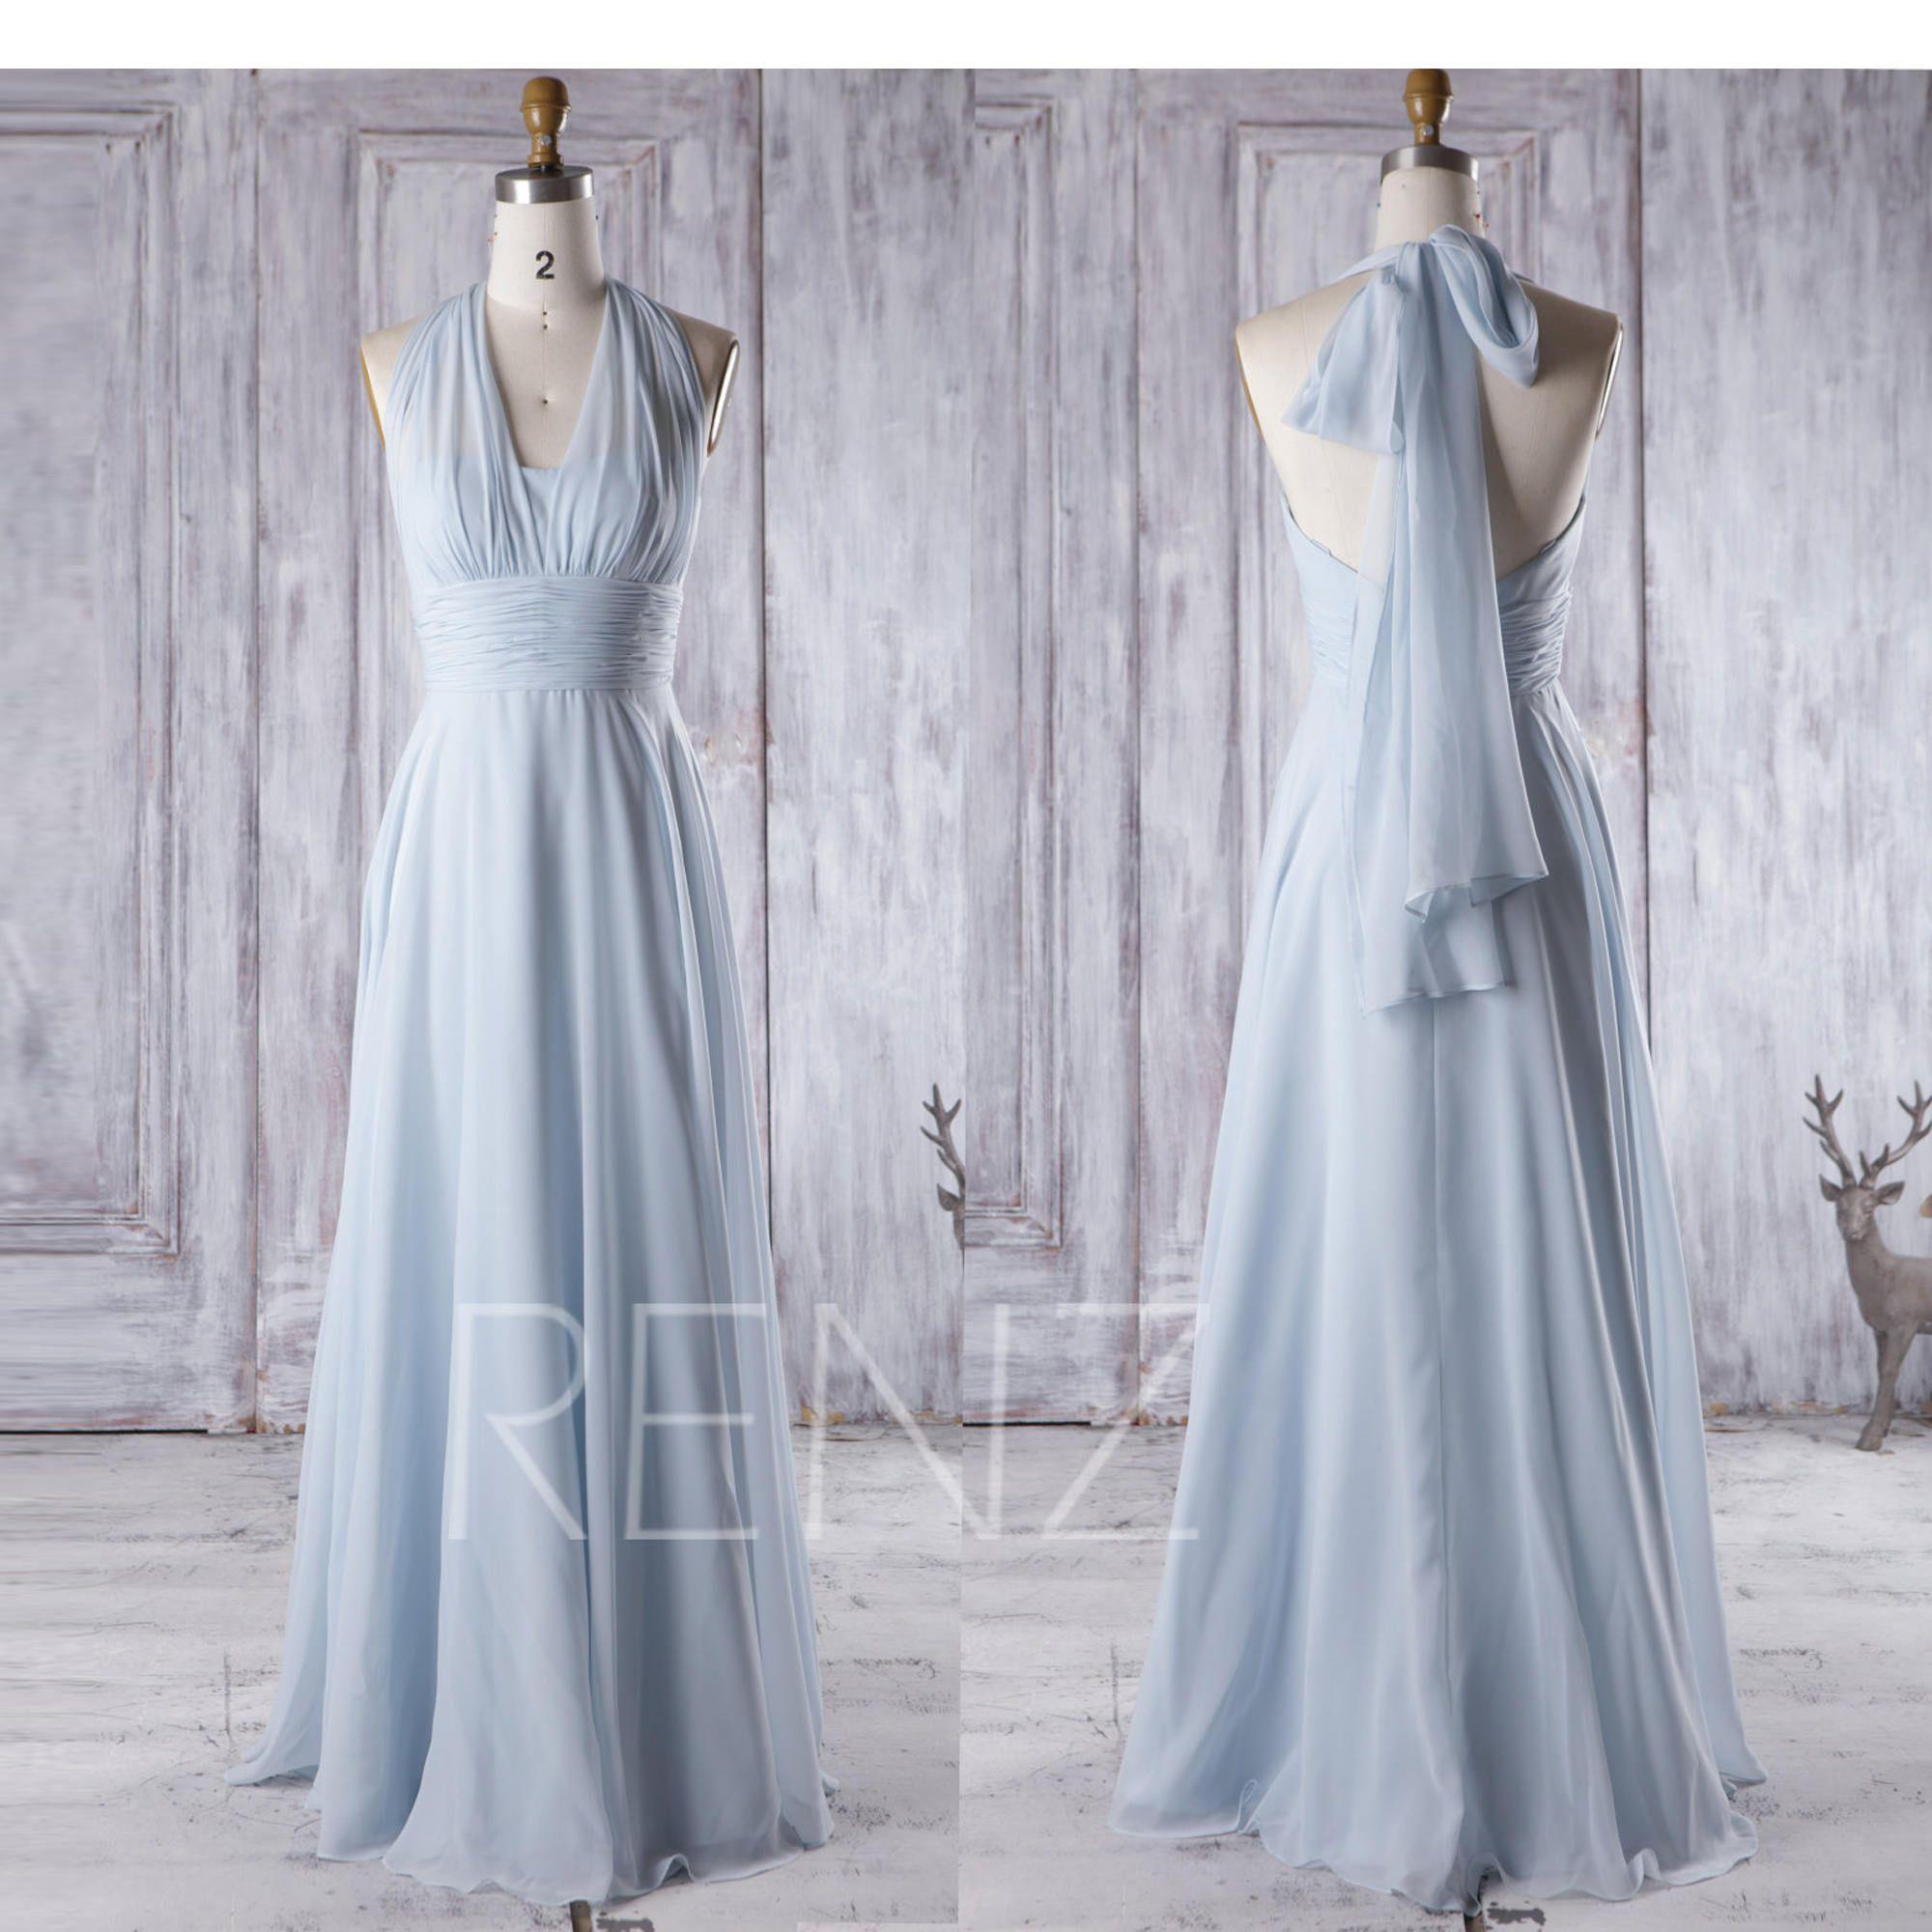 Light blue dress for wedding  Bridesmaid Dress Light Blue Chiffon DressWedding DressConvertible